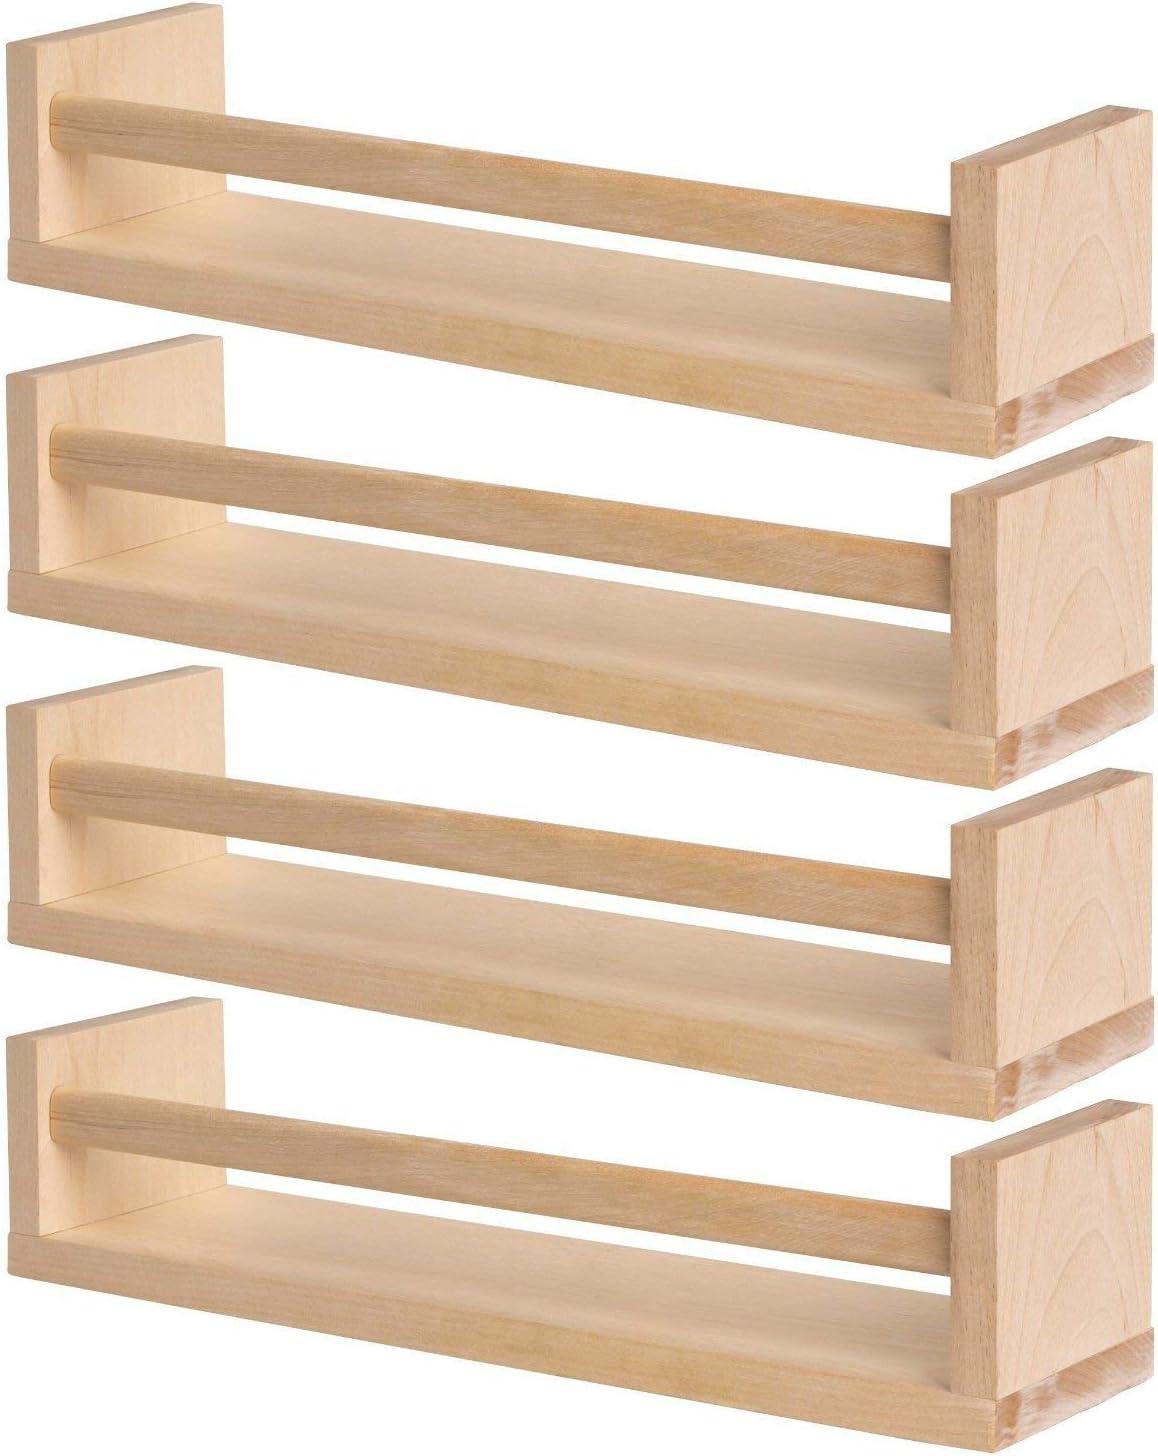 Ikea 4 Gewurzregal Aus Holz Kinderzimmer Bucherregal